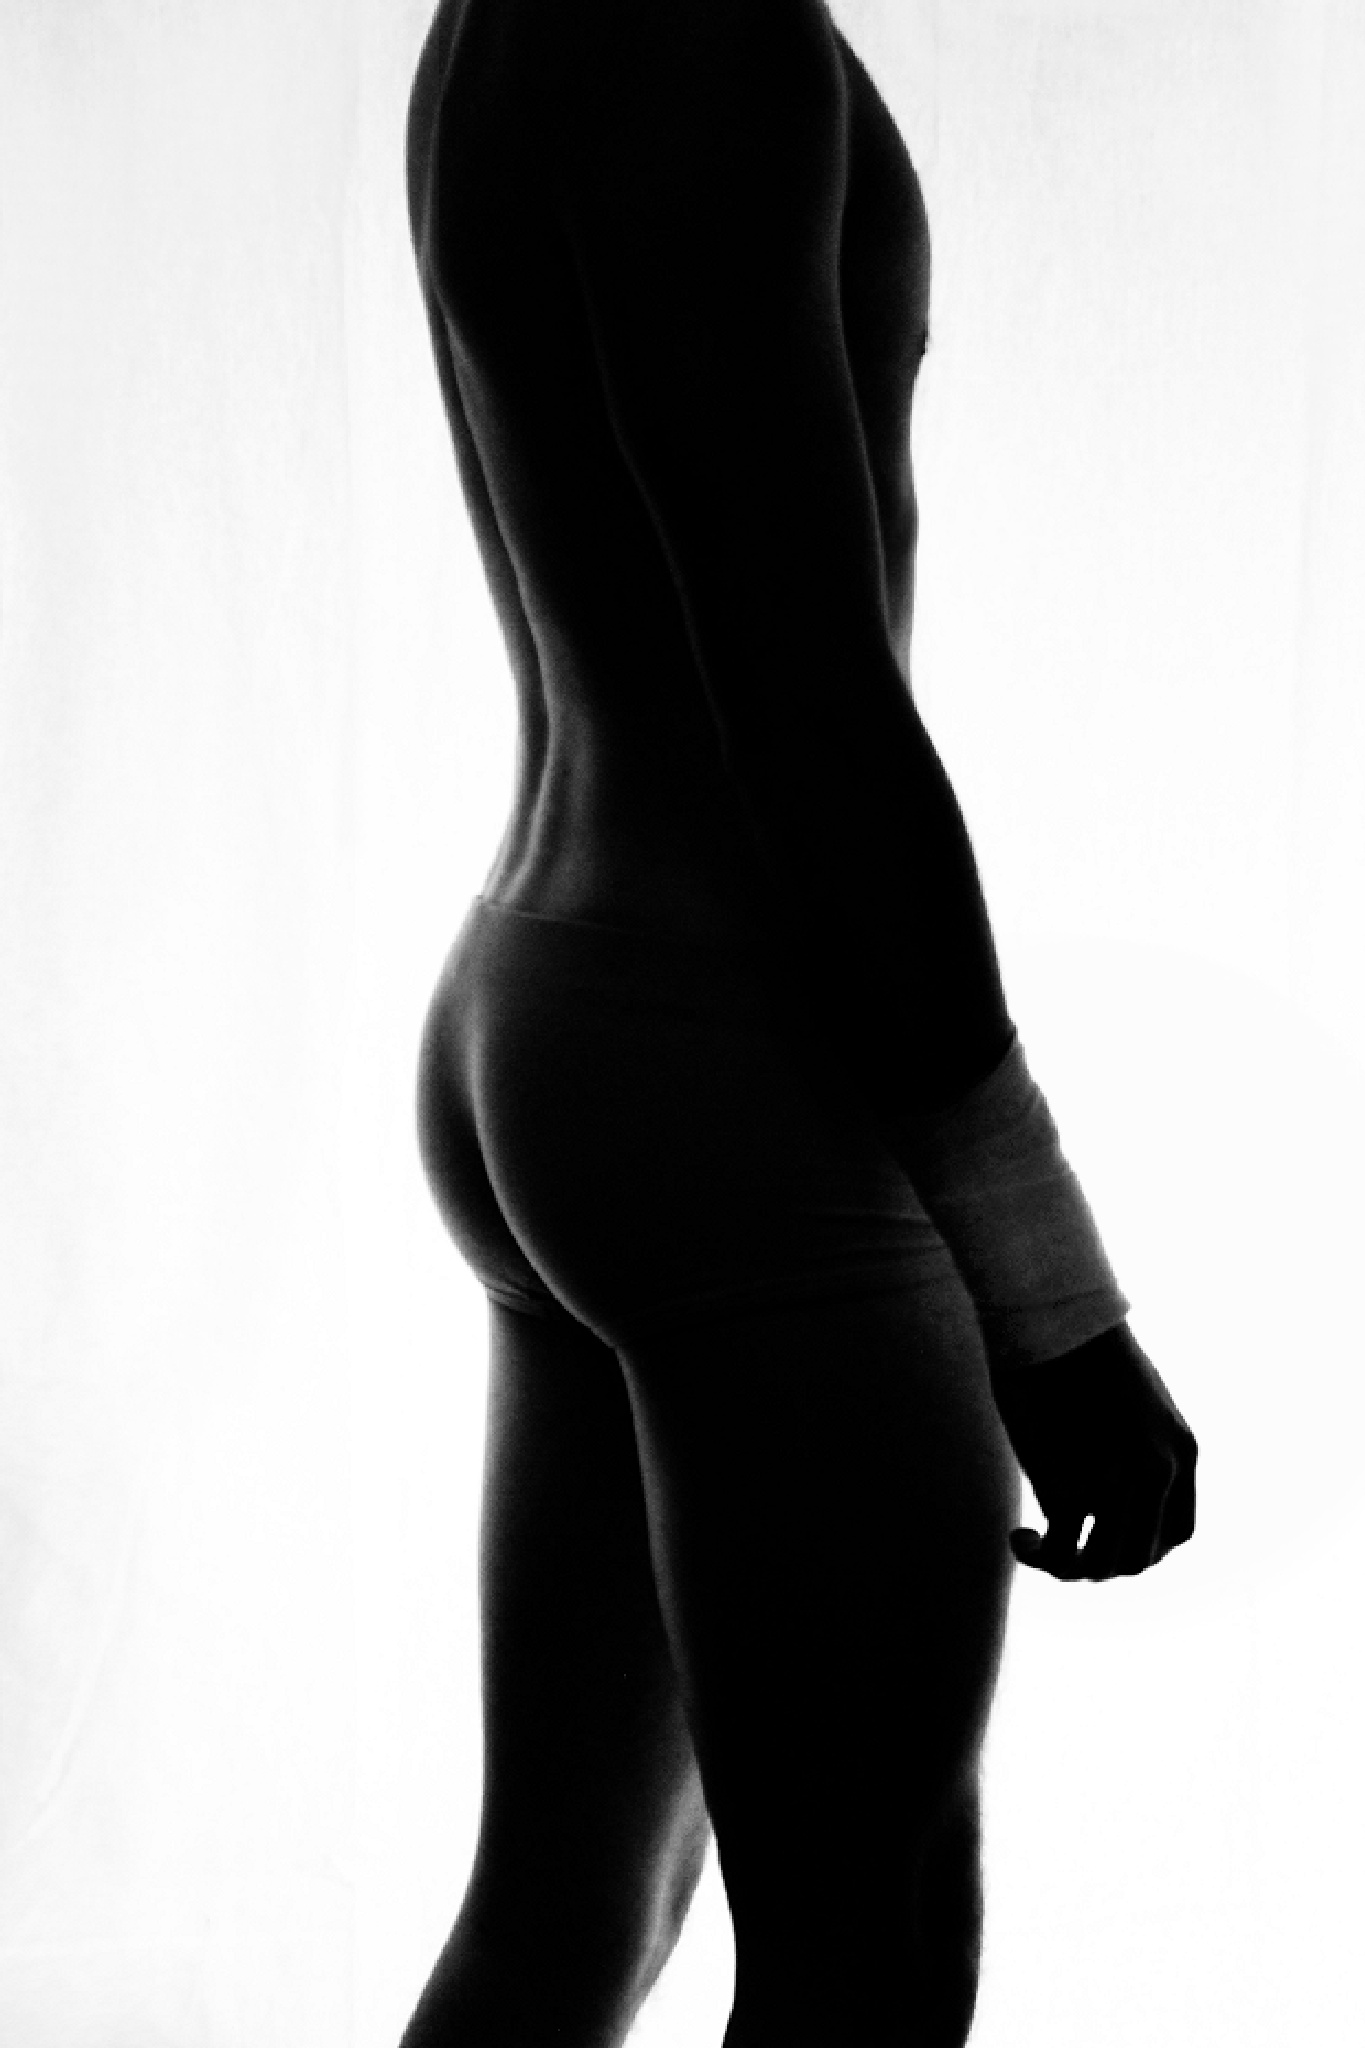 Shadow by Alex McKee